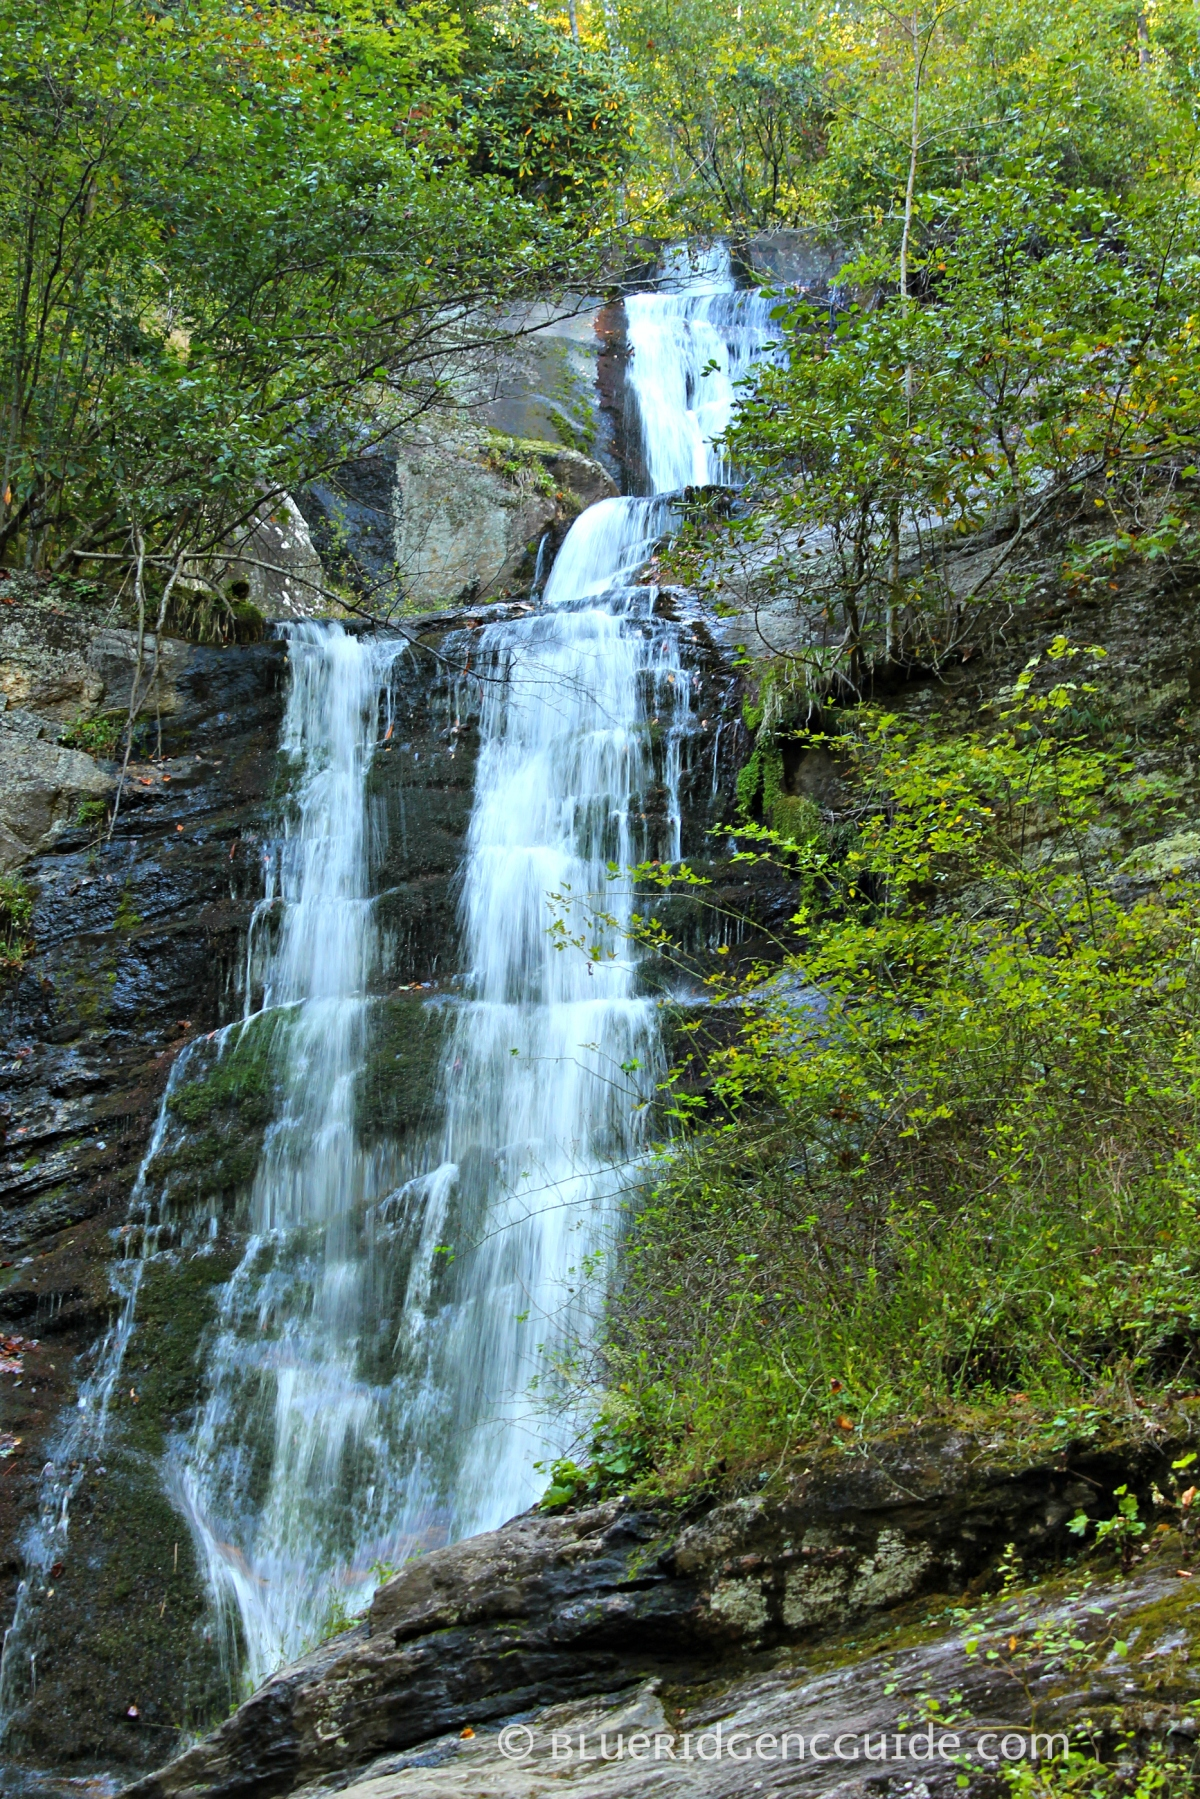 Hiking Trails- TOM'S CREEK FALLS,Marion